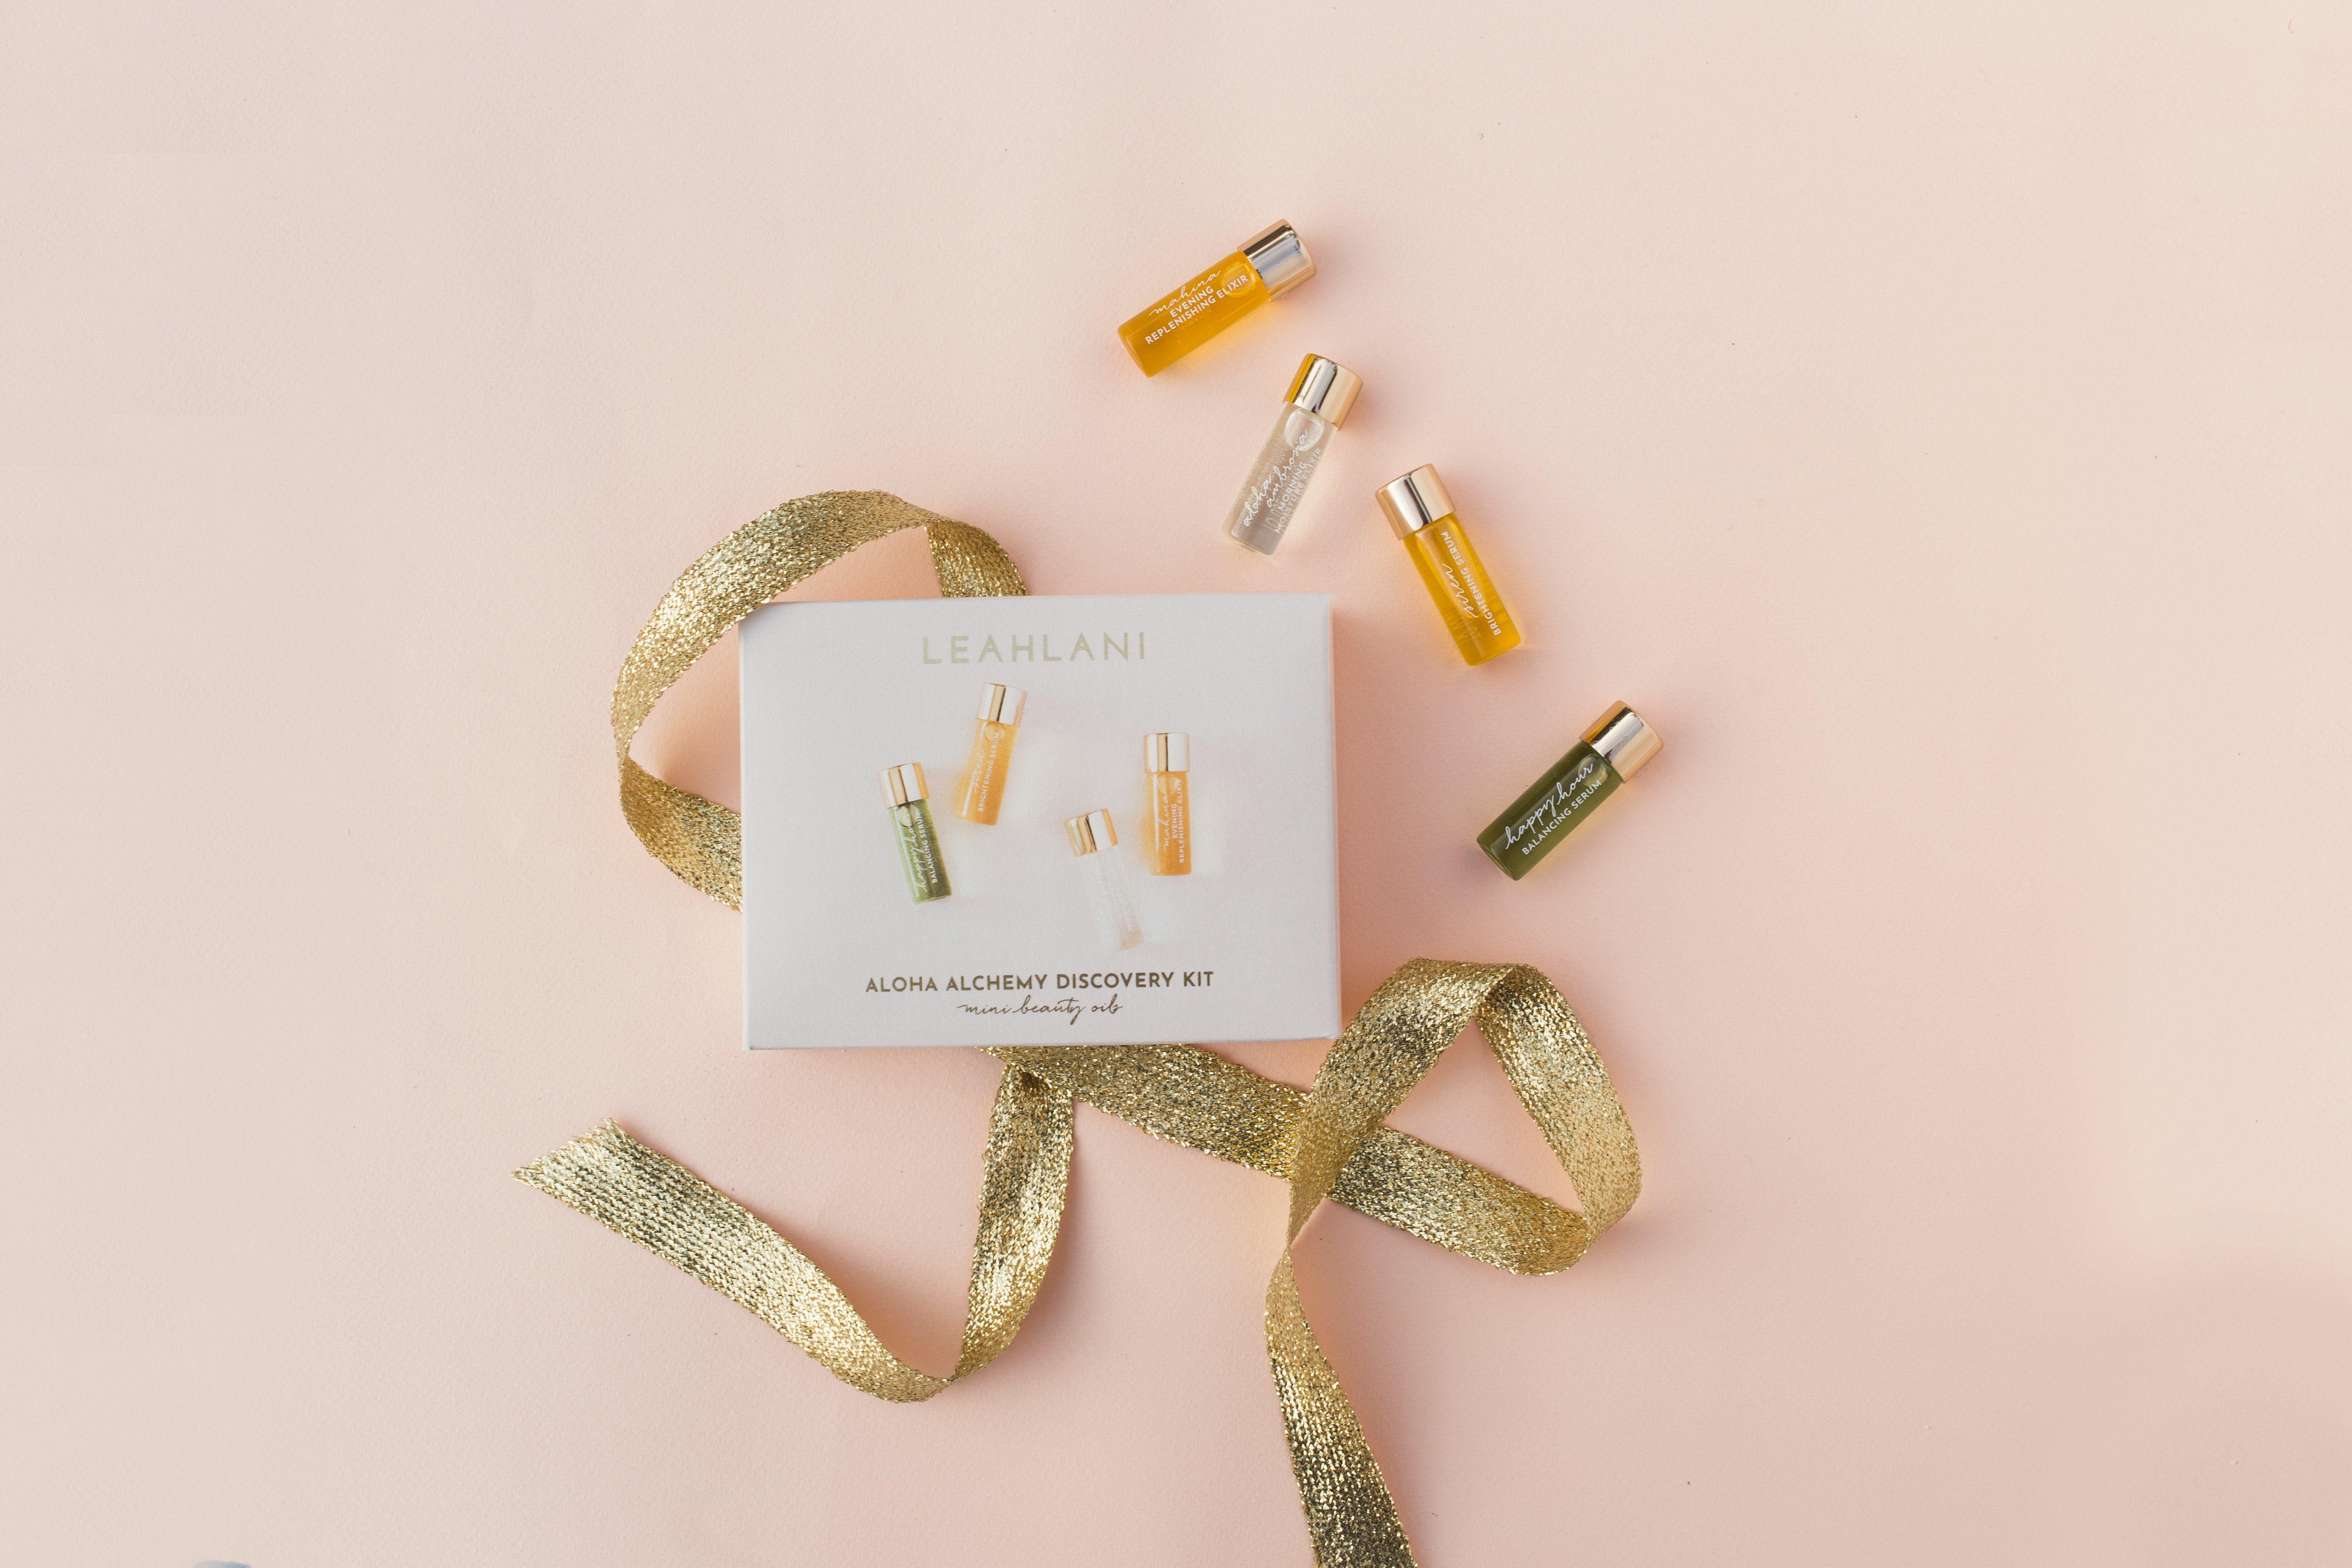 Aloha Alchemy Discovery Kit Mini Beauty Oils Discovery Kit Beauty Oil Invigorating Essential Oils